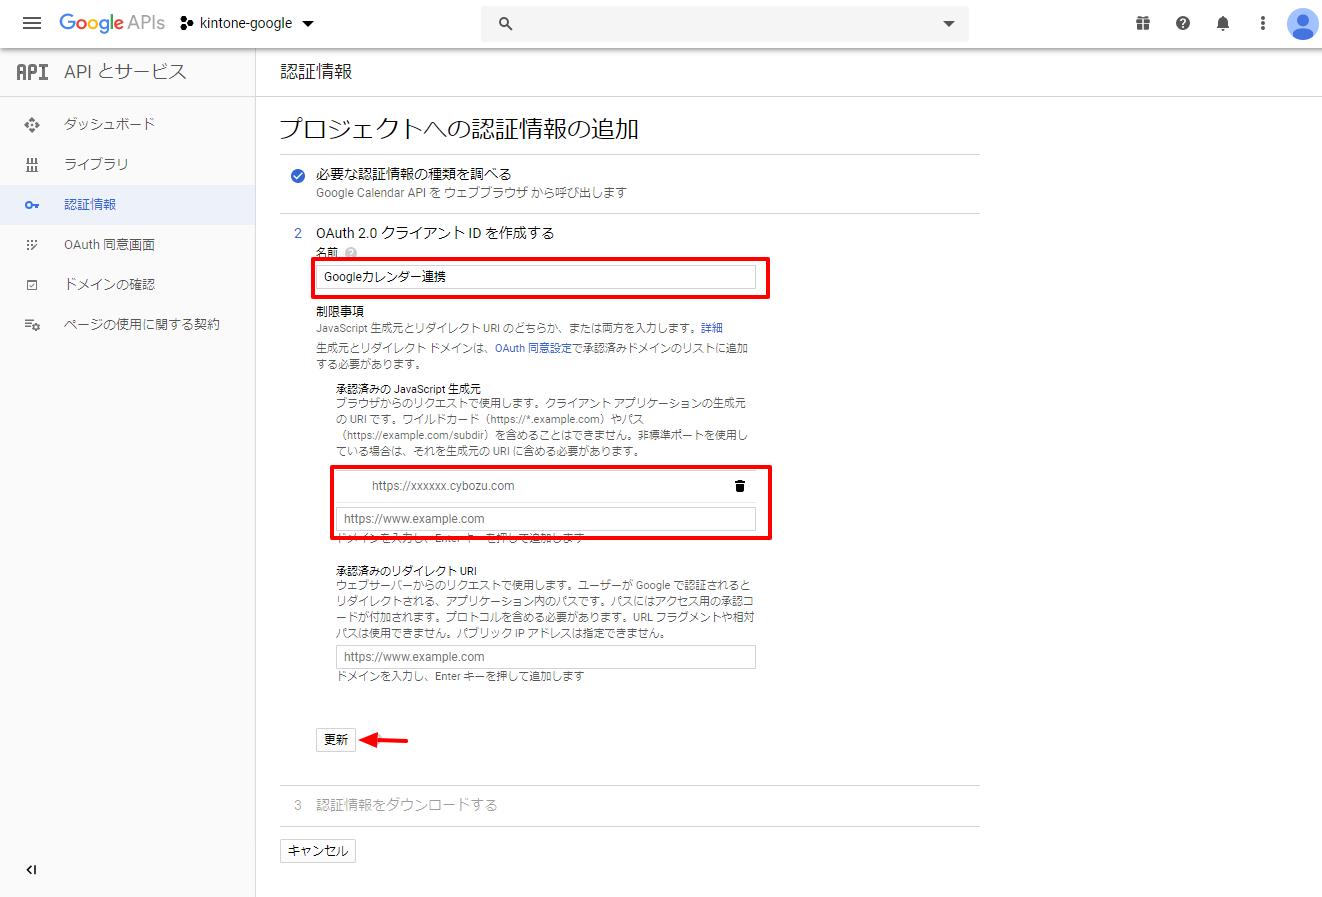 【kintone-Googleカレンダー連携プラグイン】プロジェクトへの認証情報の追加